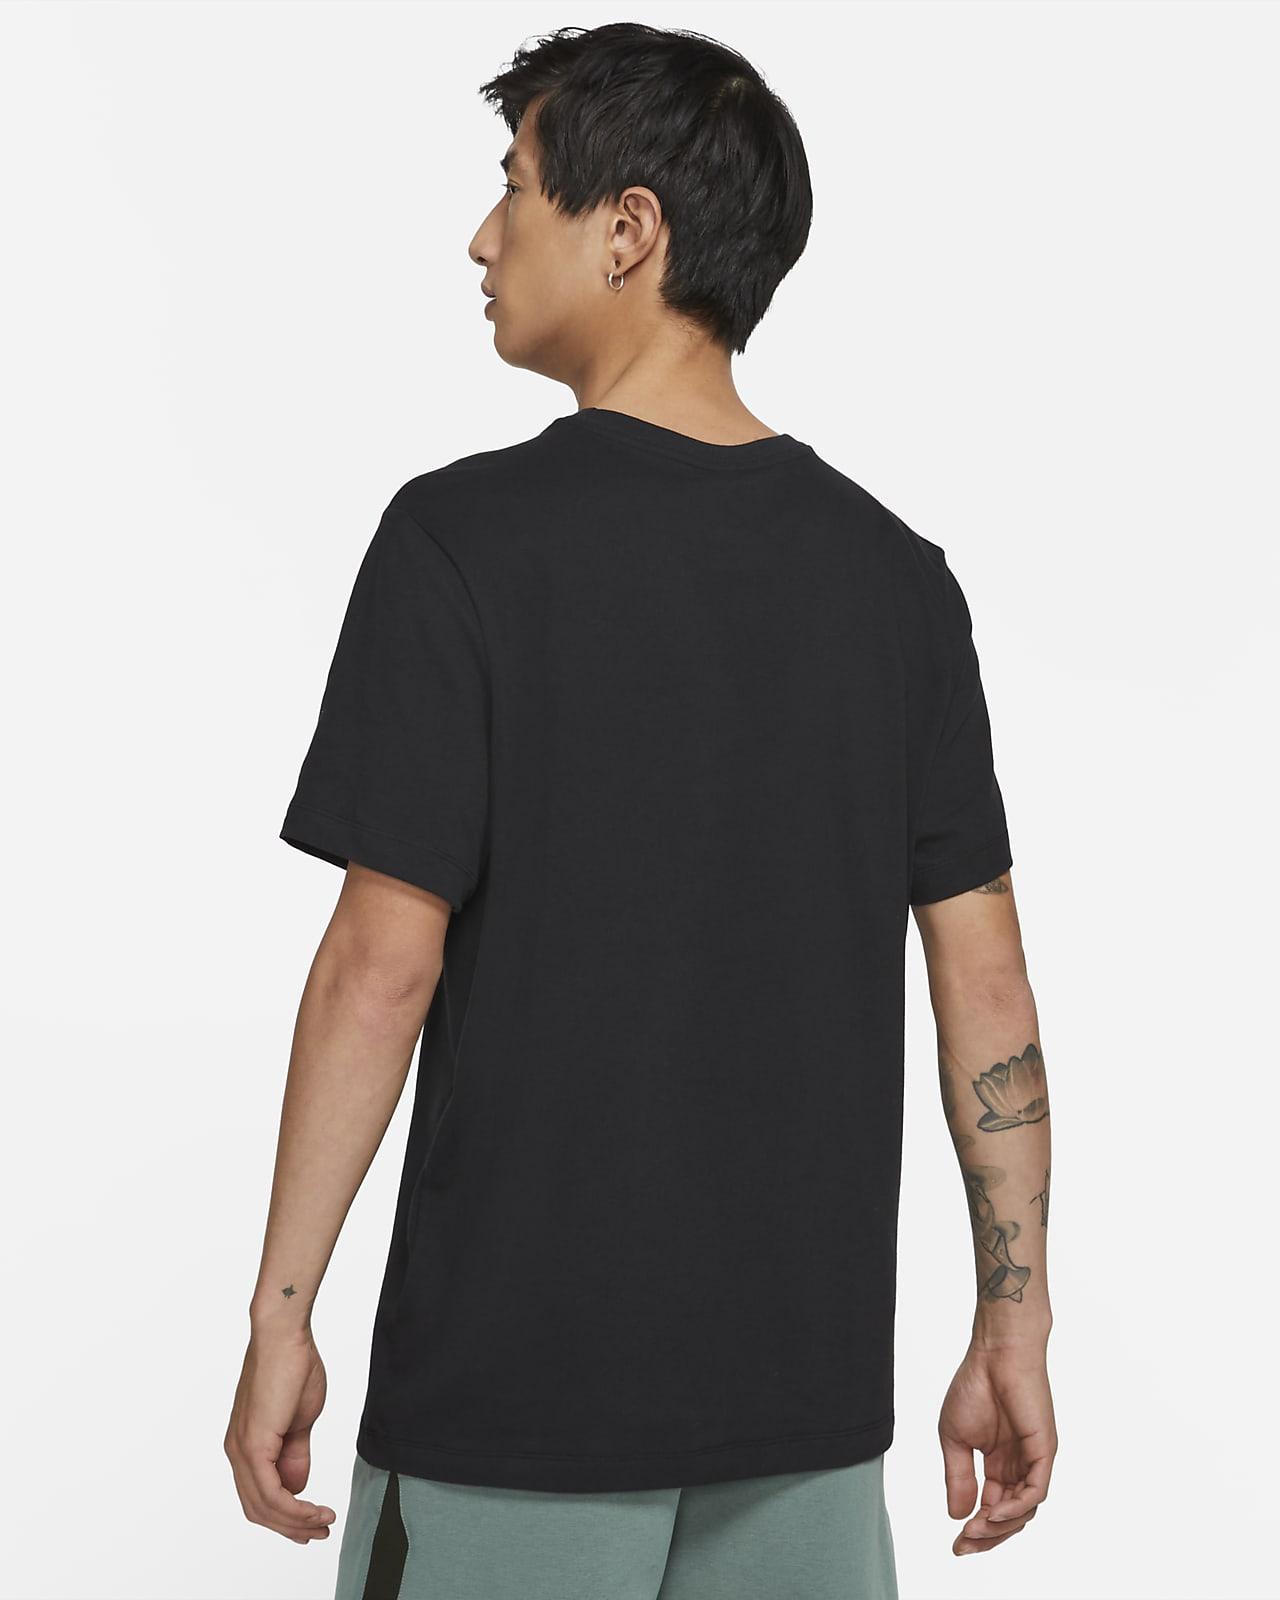 Camiseta Nike Dri-Fit Masculina Preto